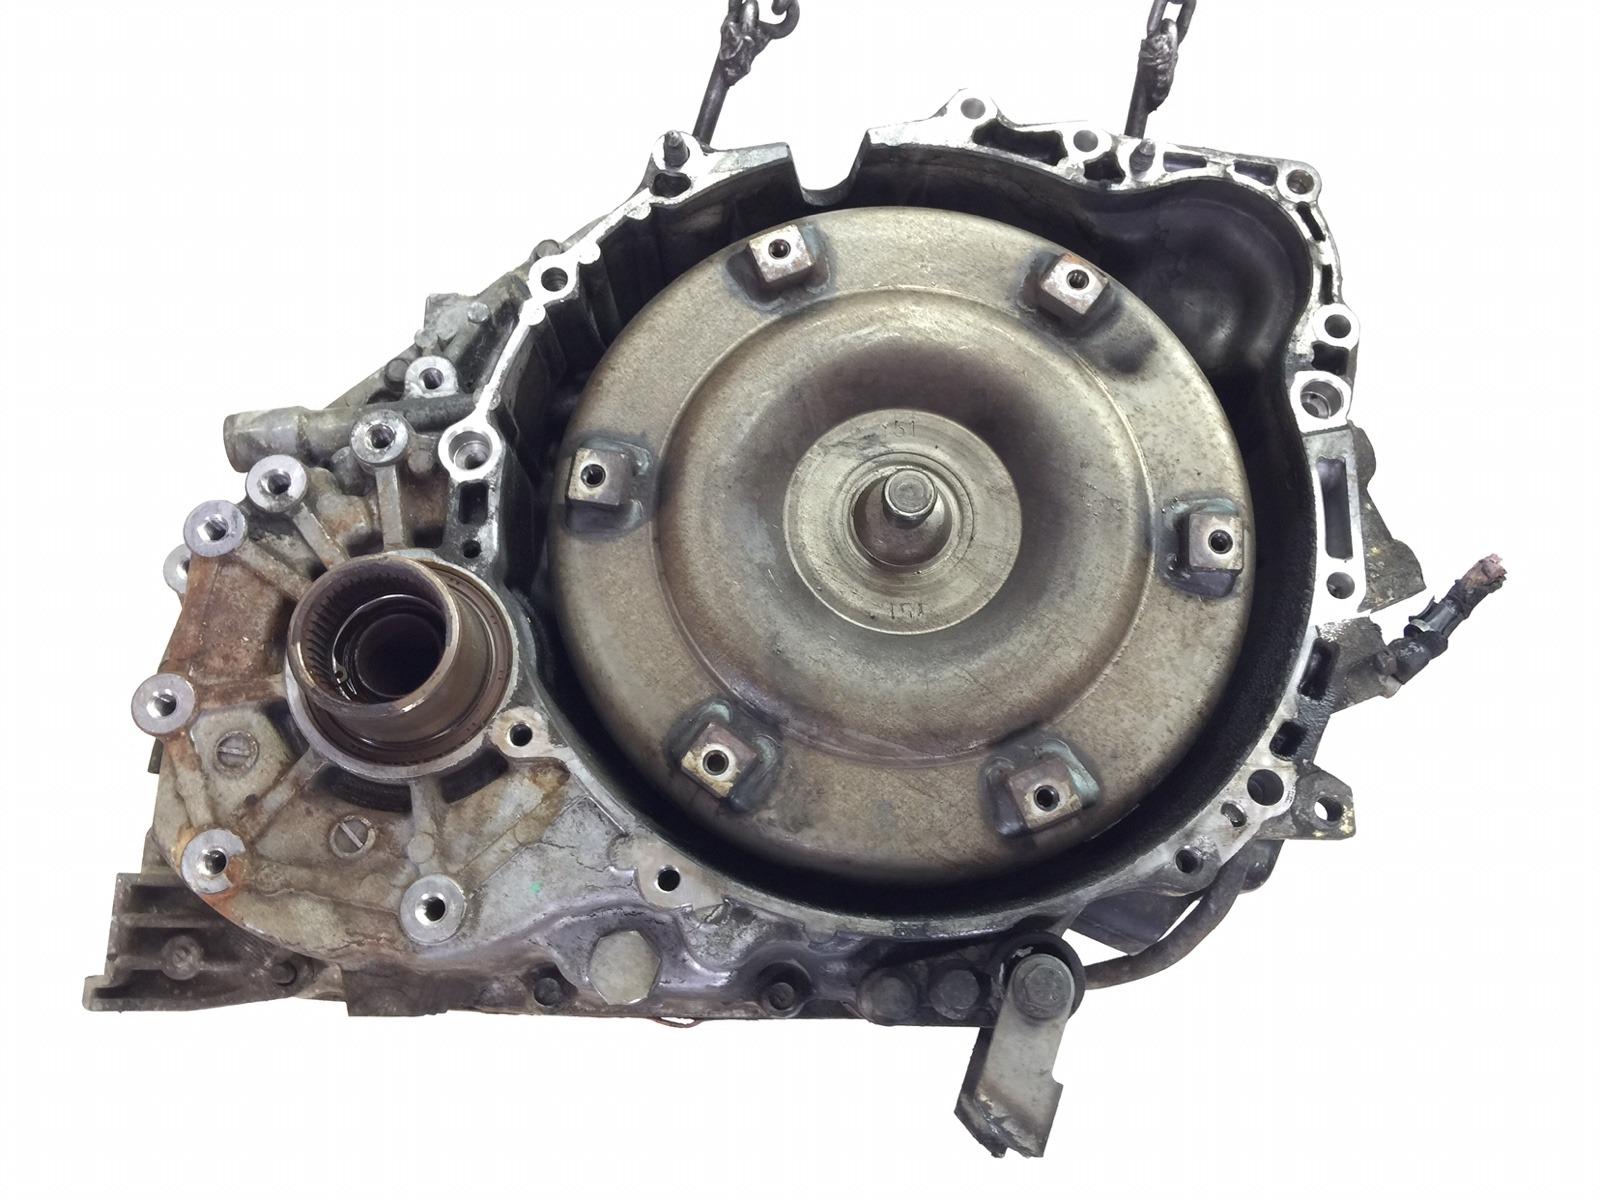 Кпп автоматическая (акпп) Volvo Xc90 2.4 D5 2004 (б/у)